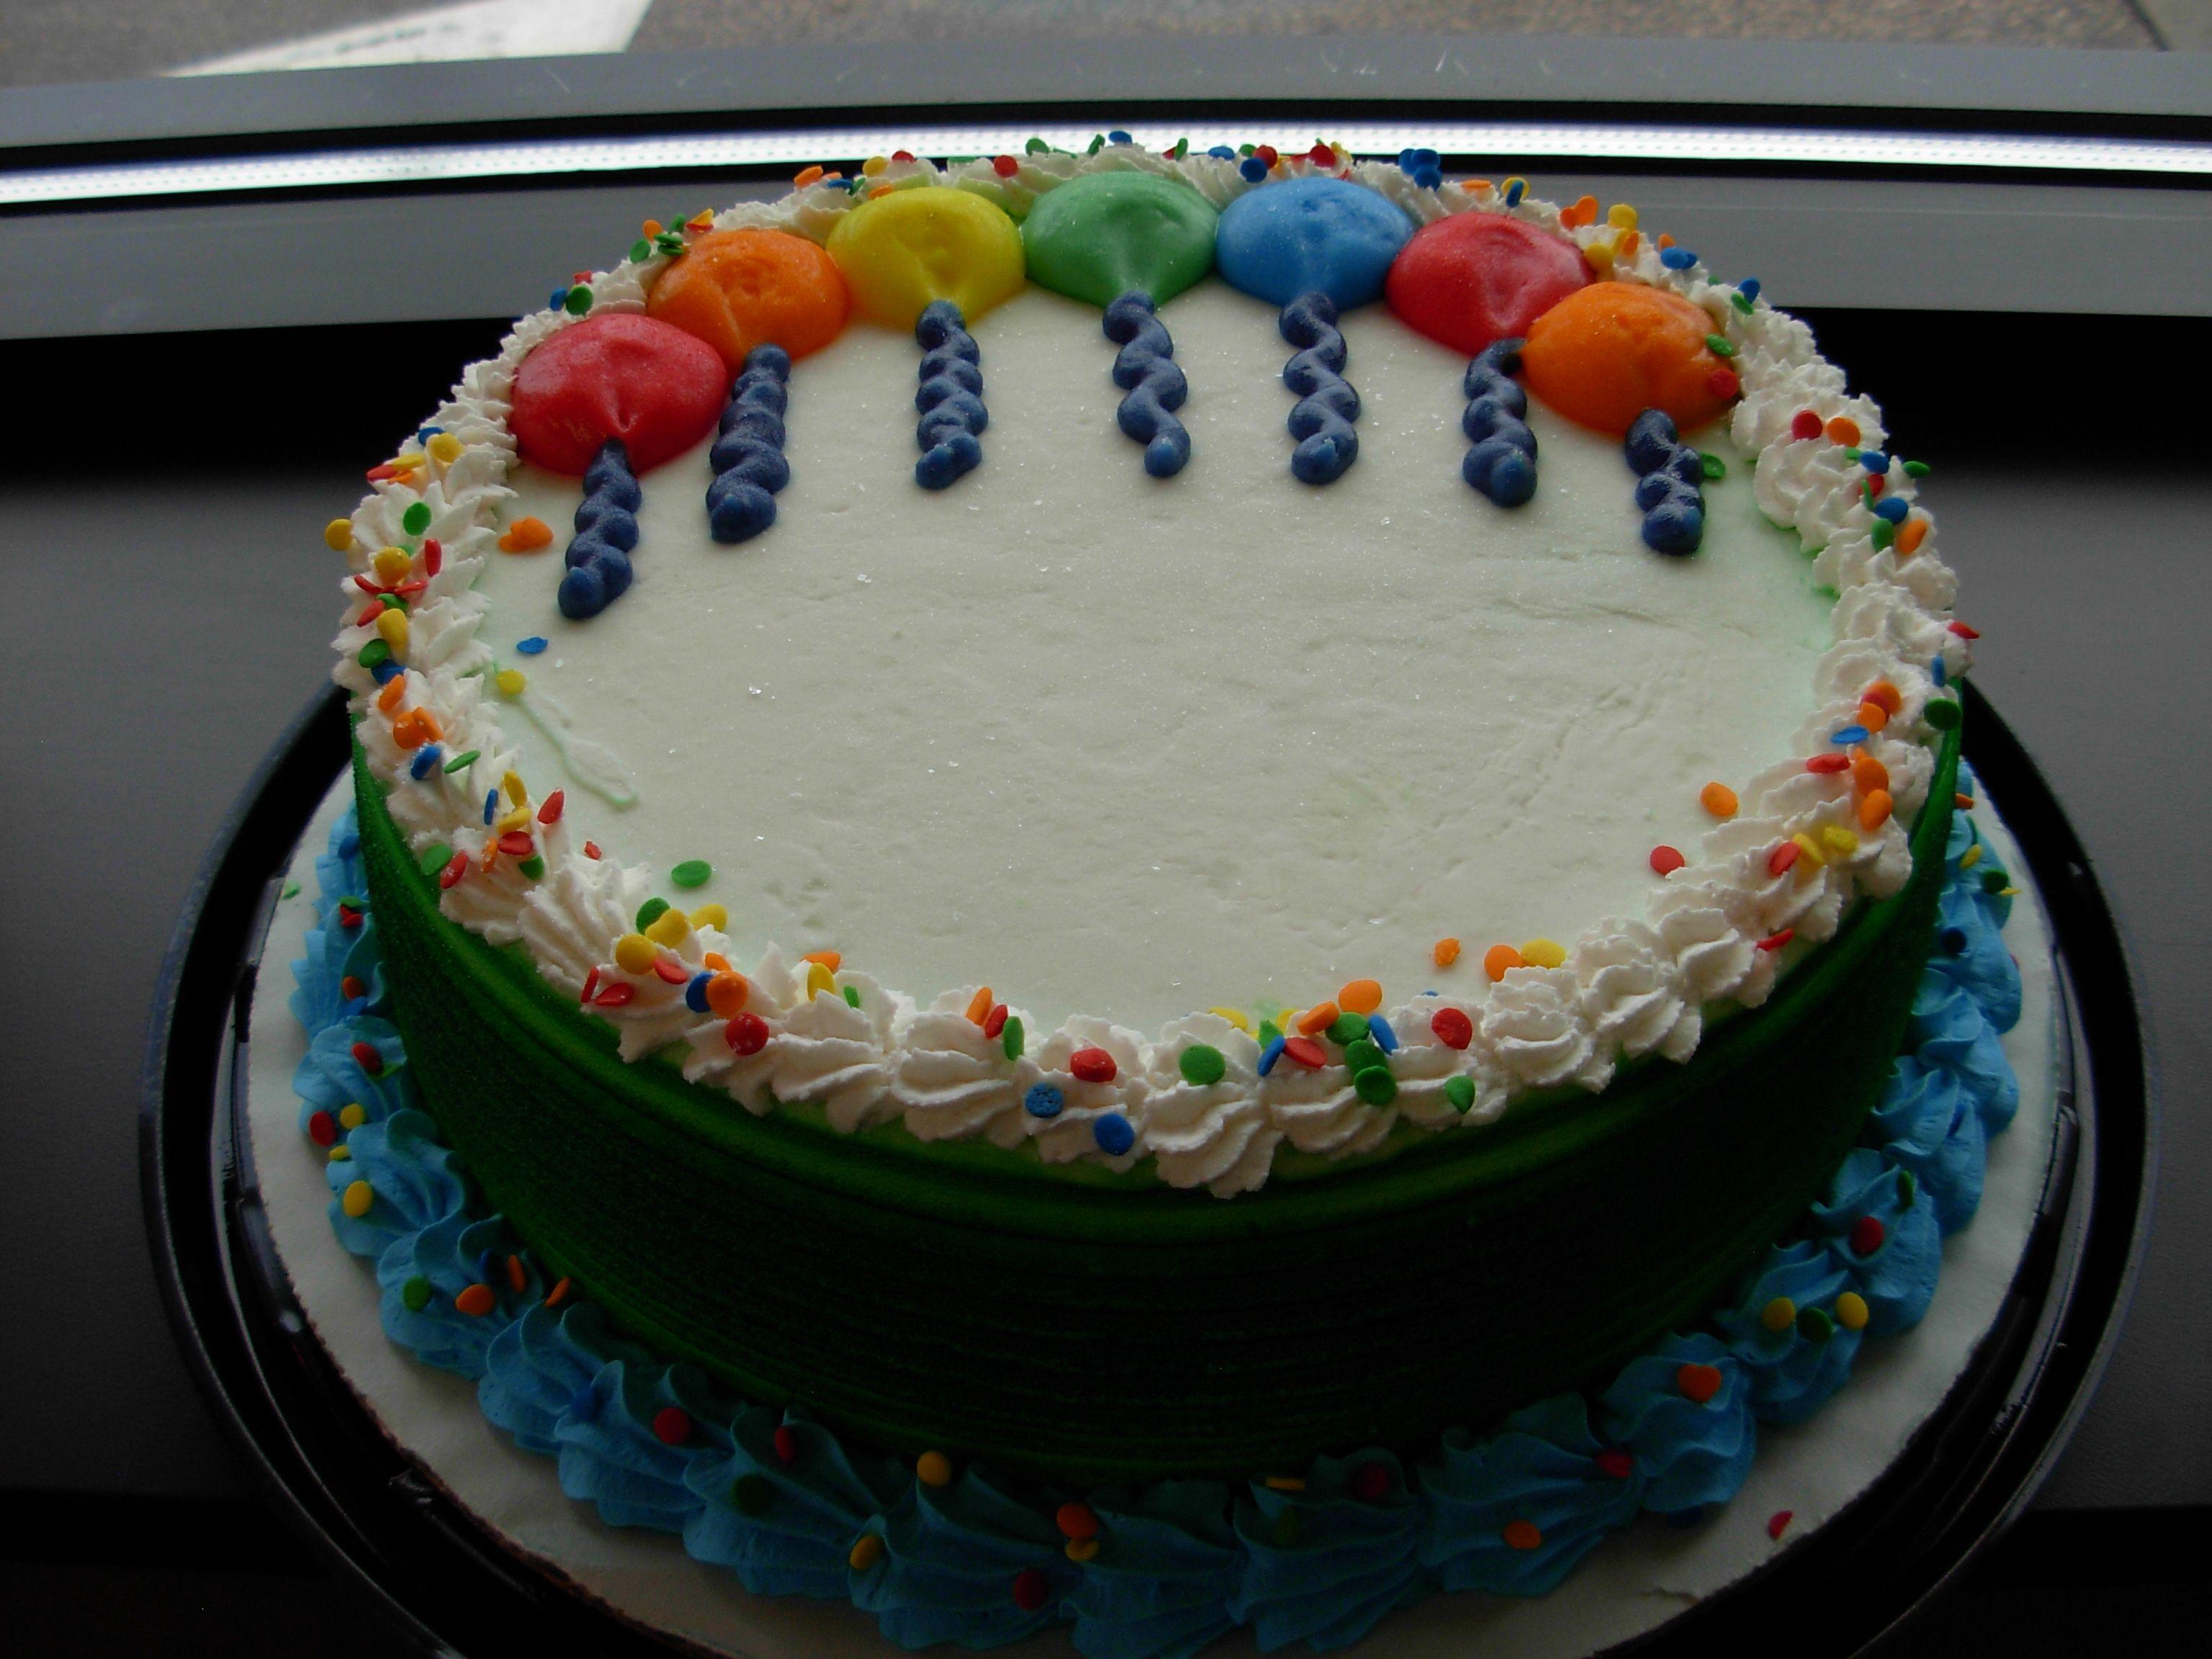 Birthday Balloon Dq Dairy Queen Ice Cream Cake The Cake Lady